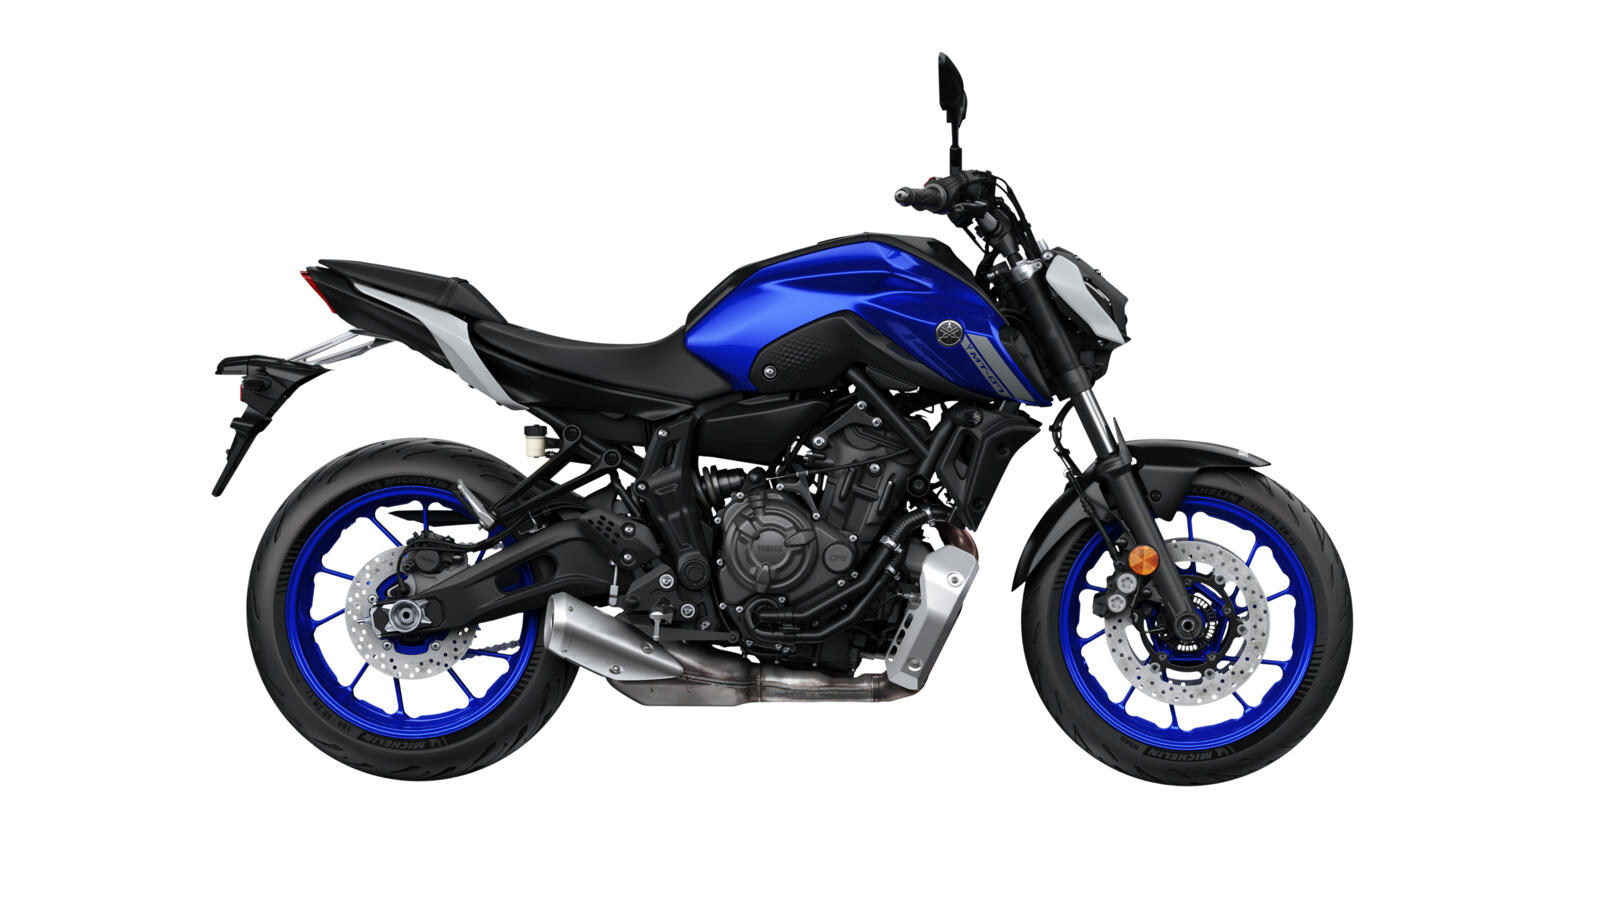 Yamaha MT-07 nu bestellen